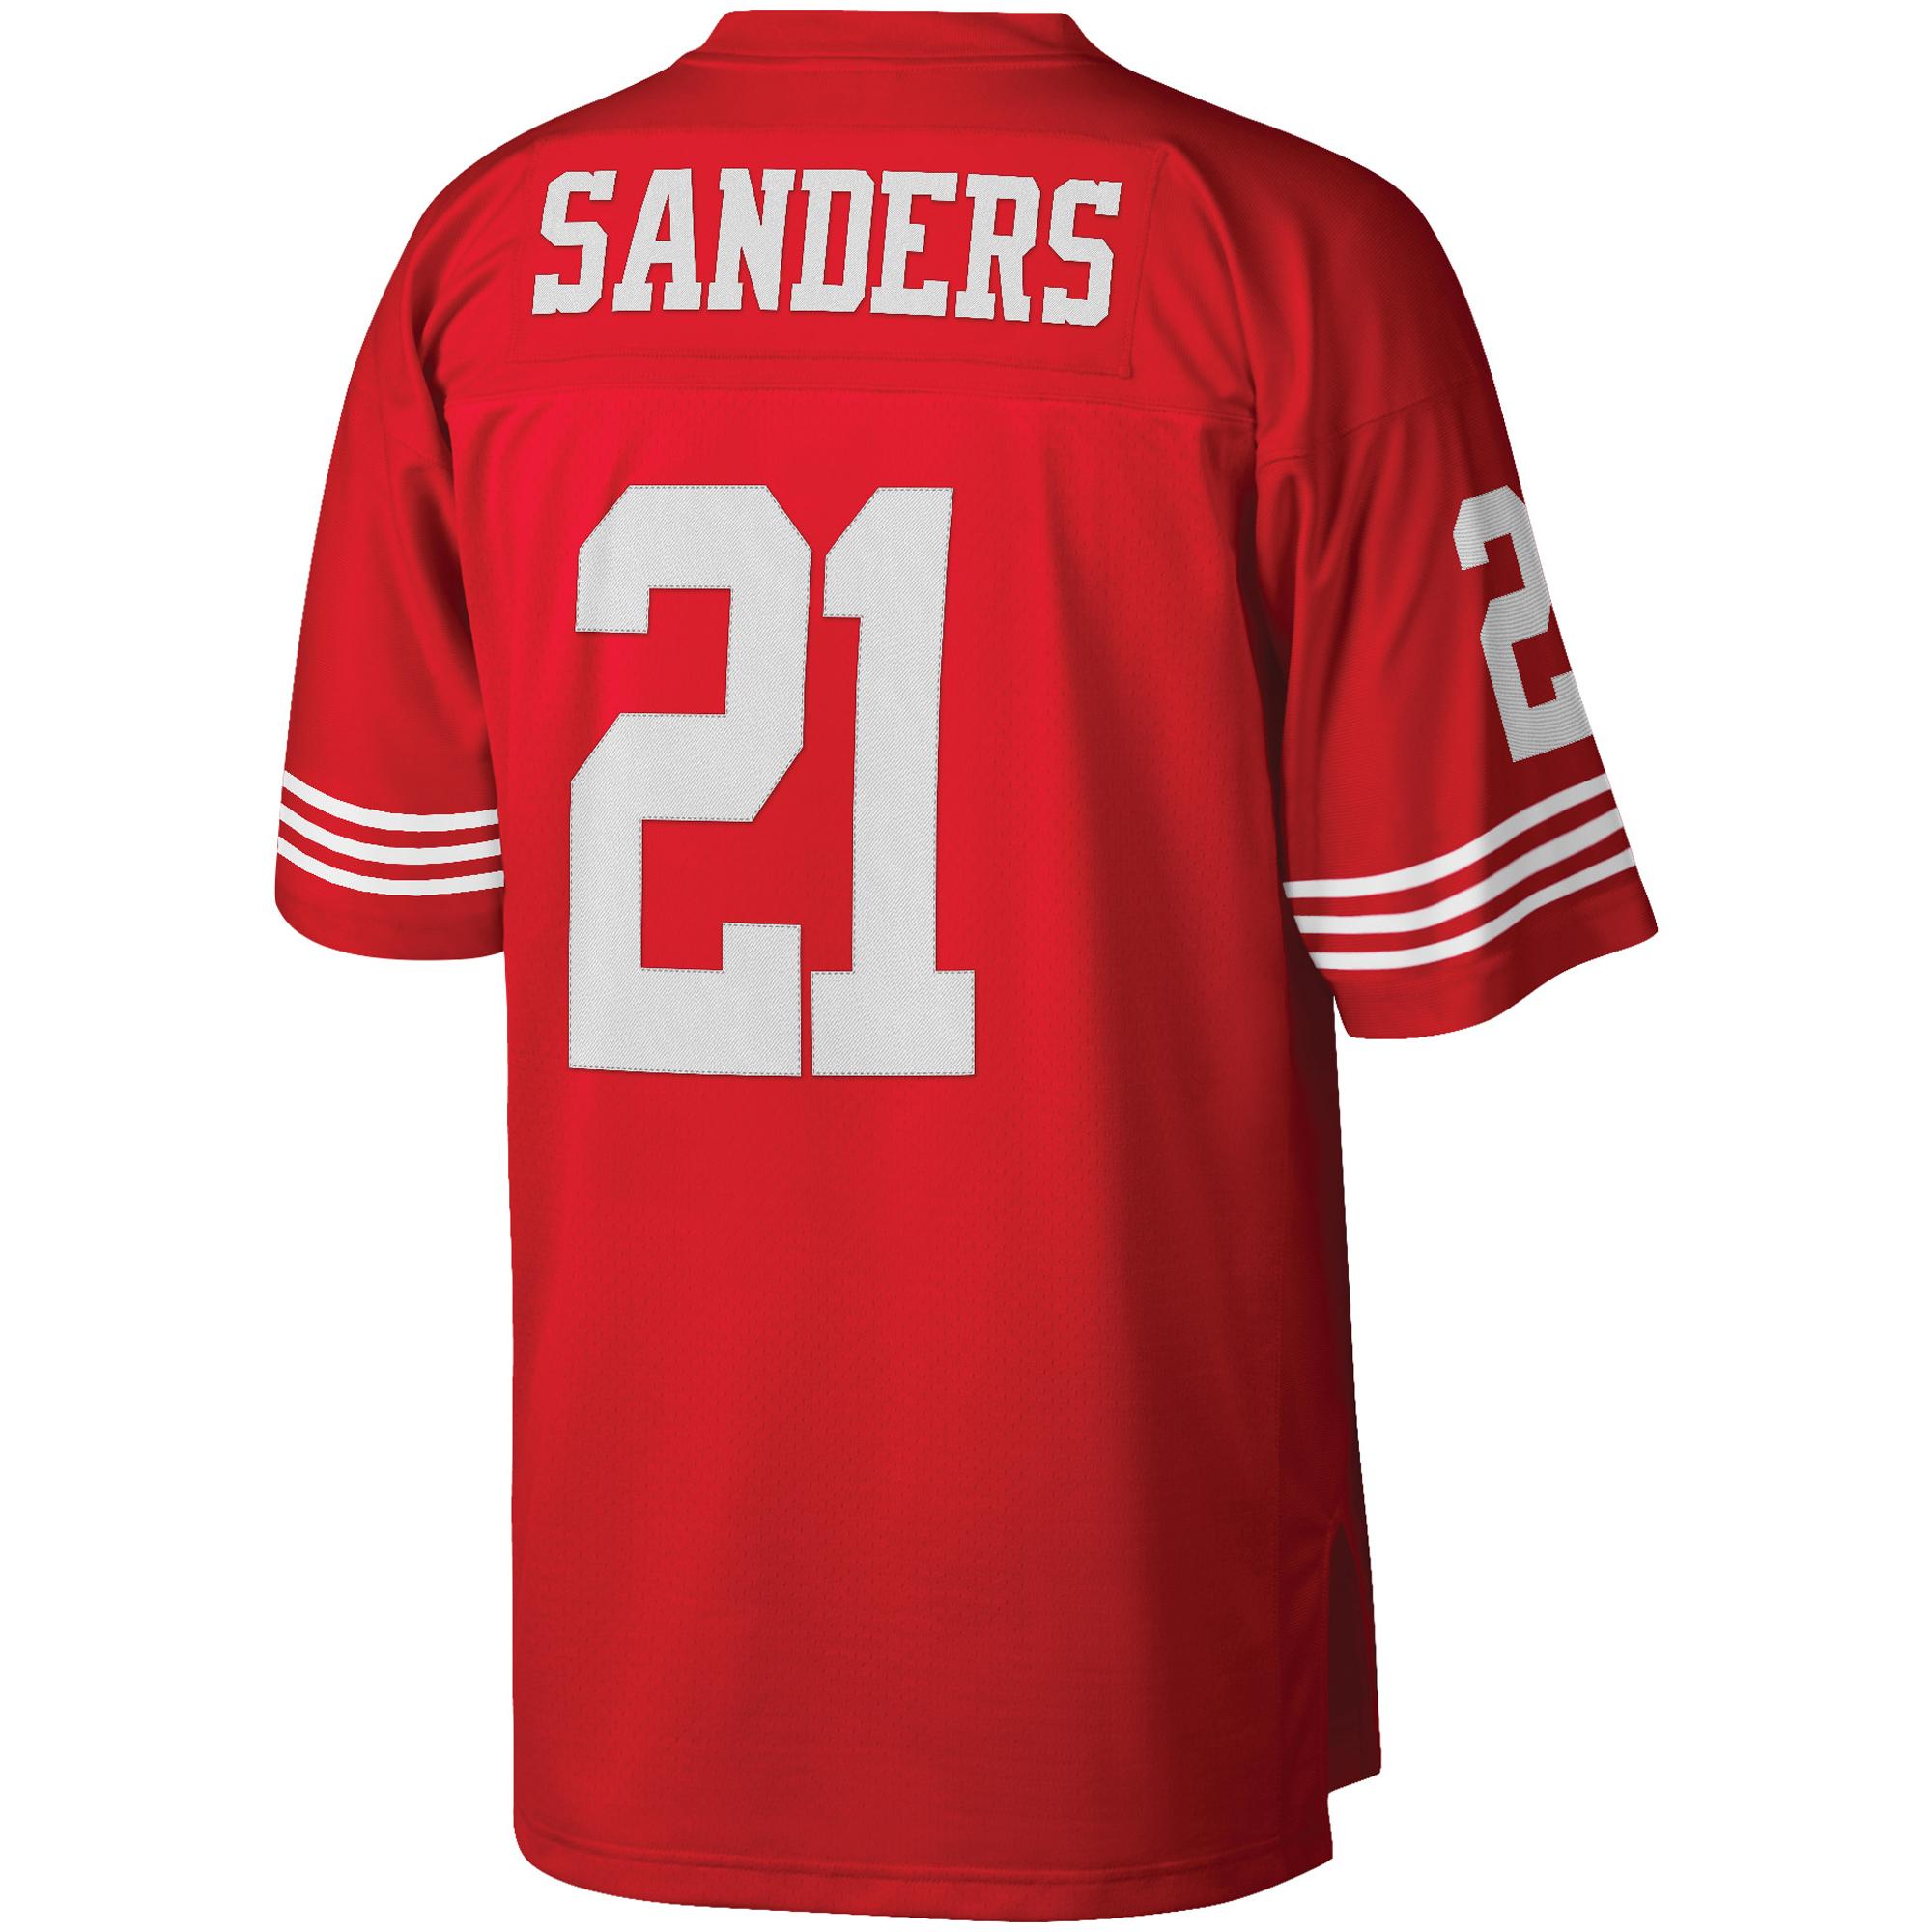 94ebb7301 Deion Sanders San Francisco 49ers Mitchell   Ness Retired Player Vintage  Replica Jersey - Scarlet - Walmart.com